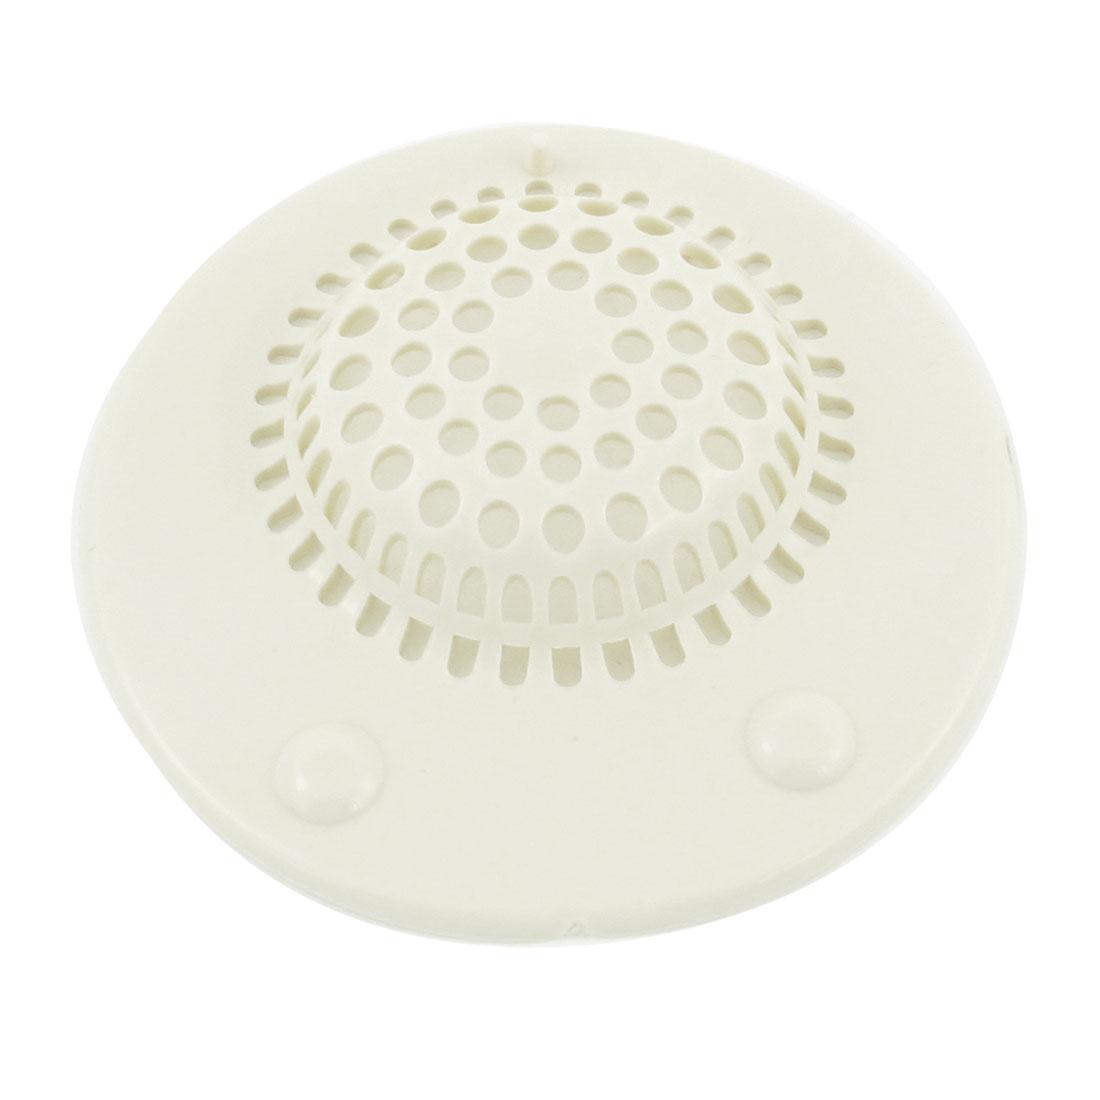 White Rubber Round Shape Kitchen Sink Strainer Drain Stopper